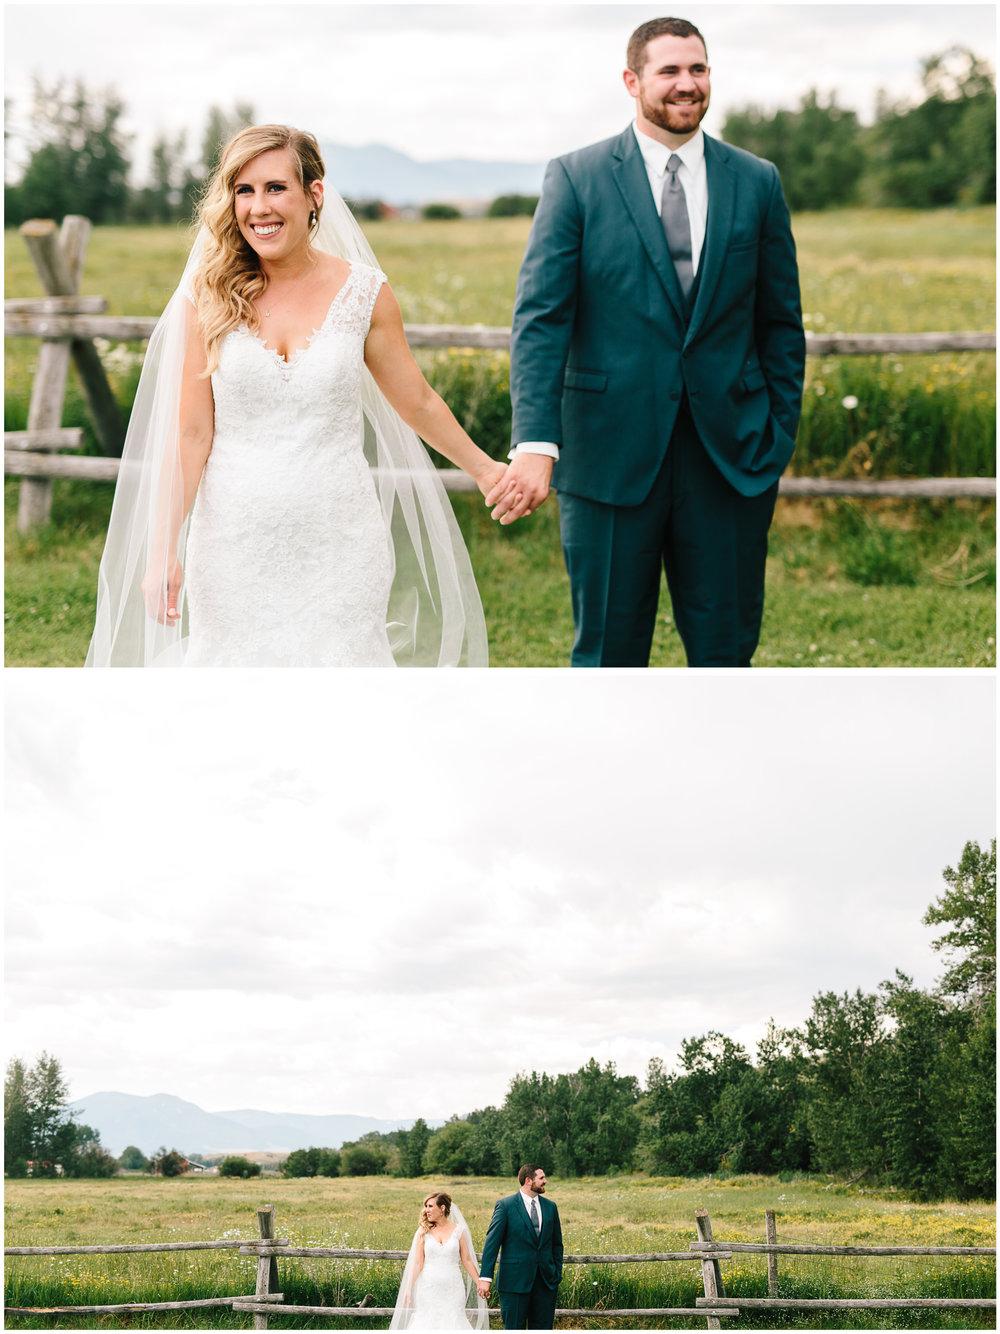 redlodge_montana_wedding_28.jpg